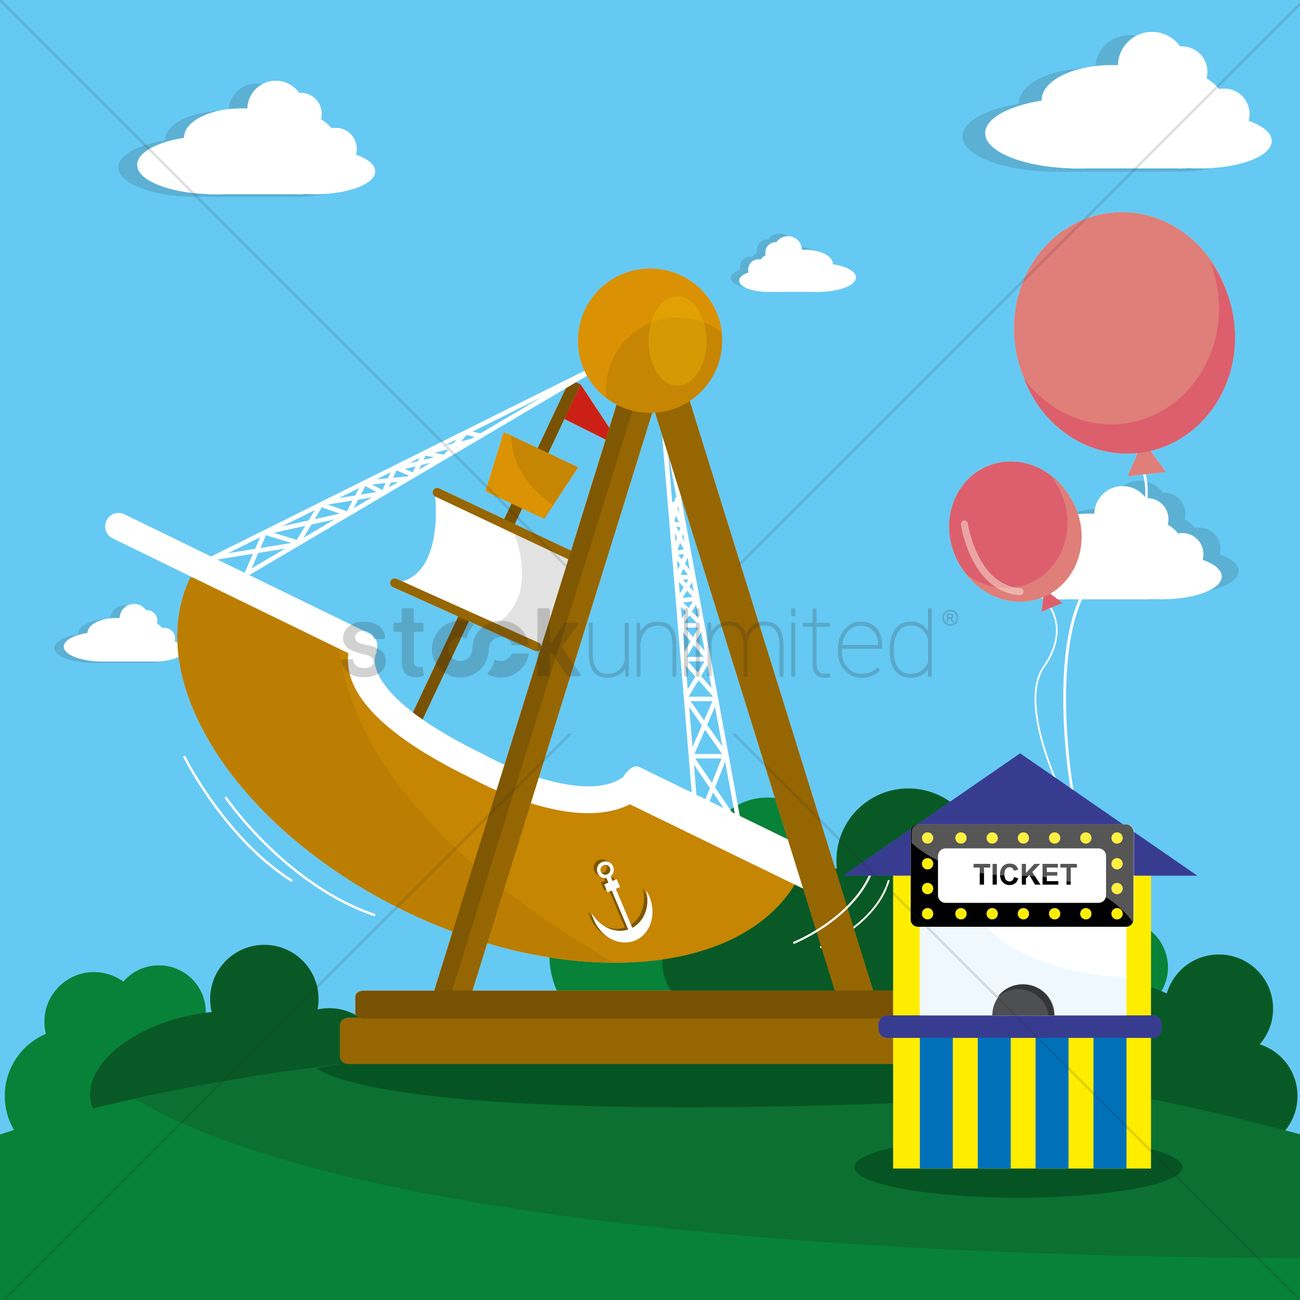 pirate ship ride vector image 1409978 stockunlimited rh stockunlimited com no man's sky redeem alpha vector ship no man's sky redeem alpha vector ship